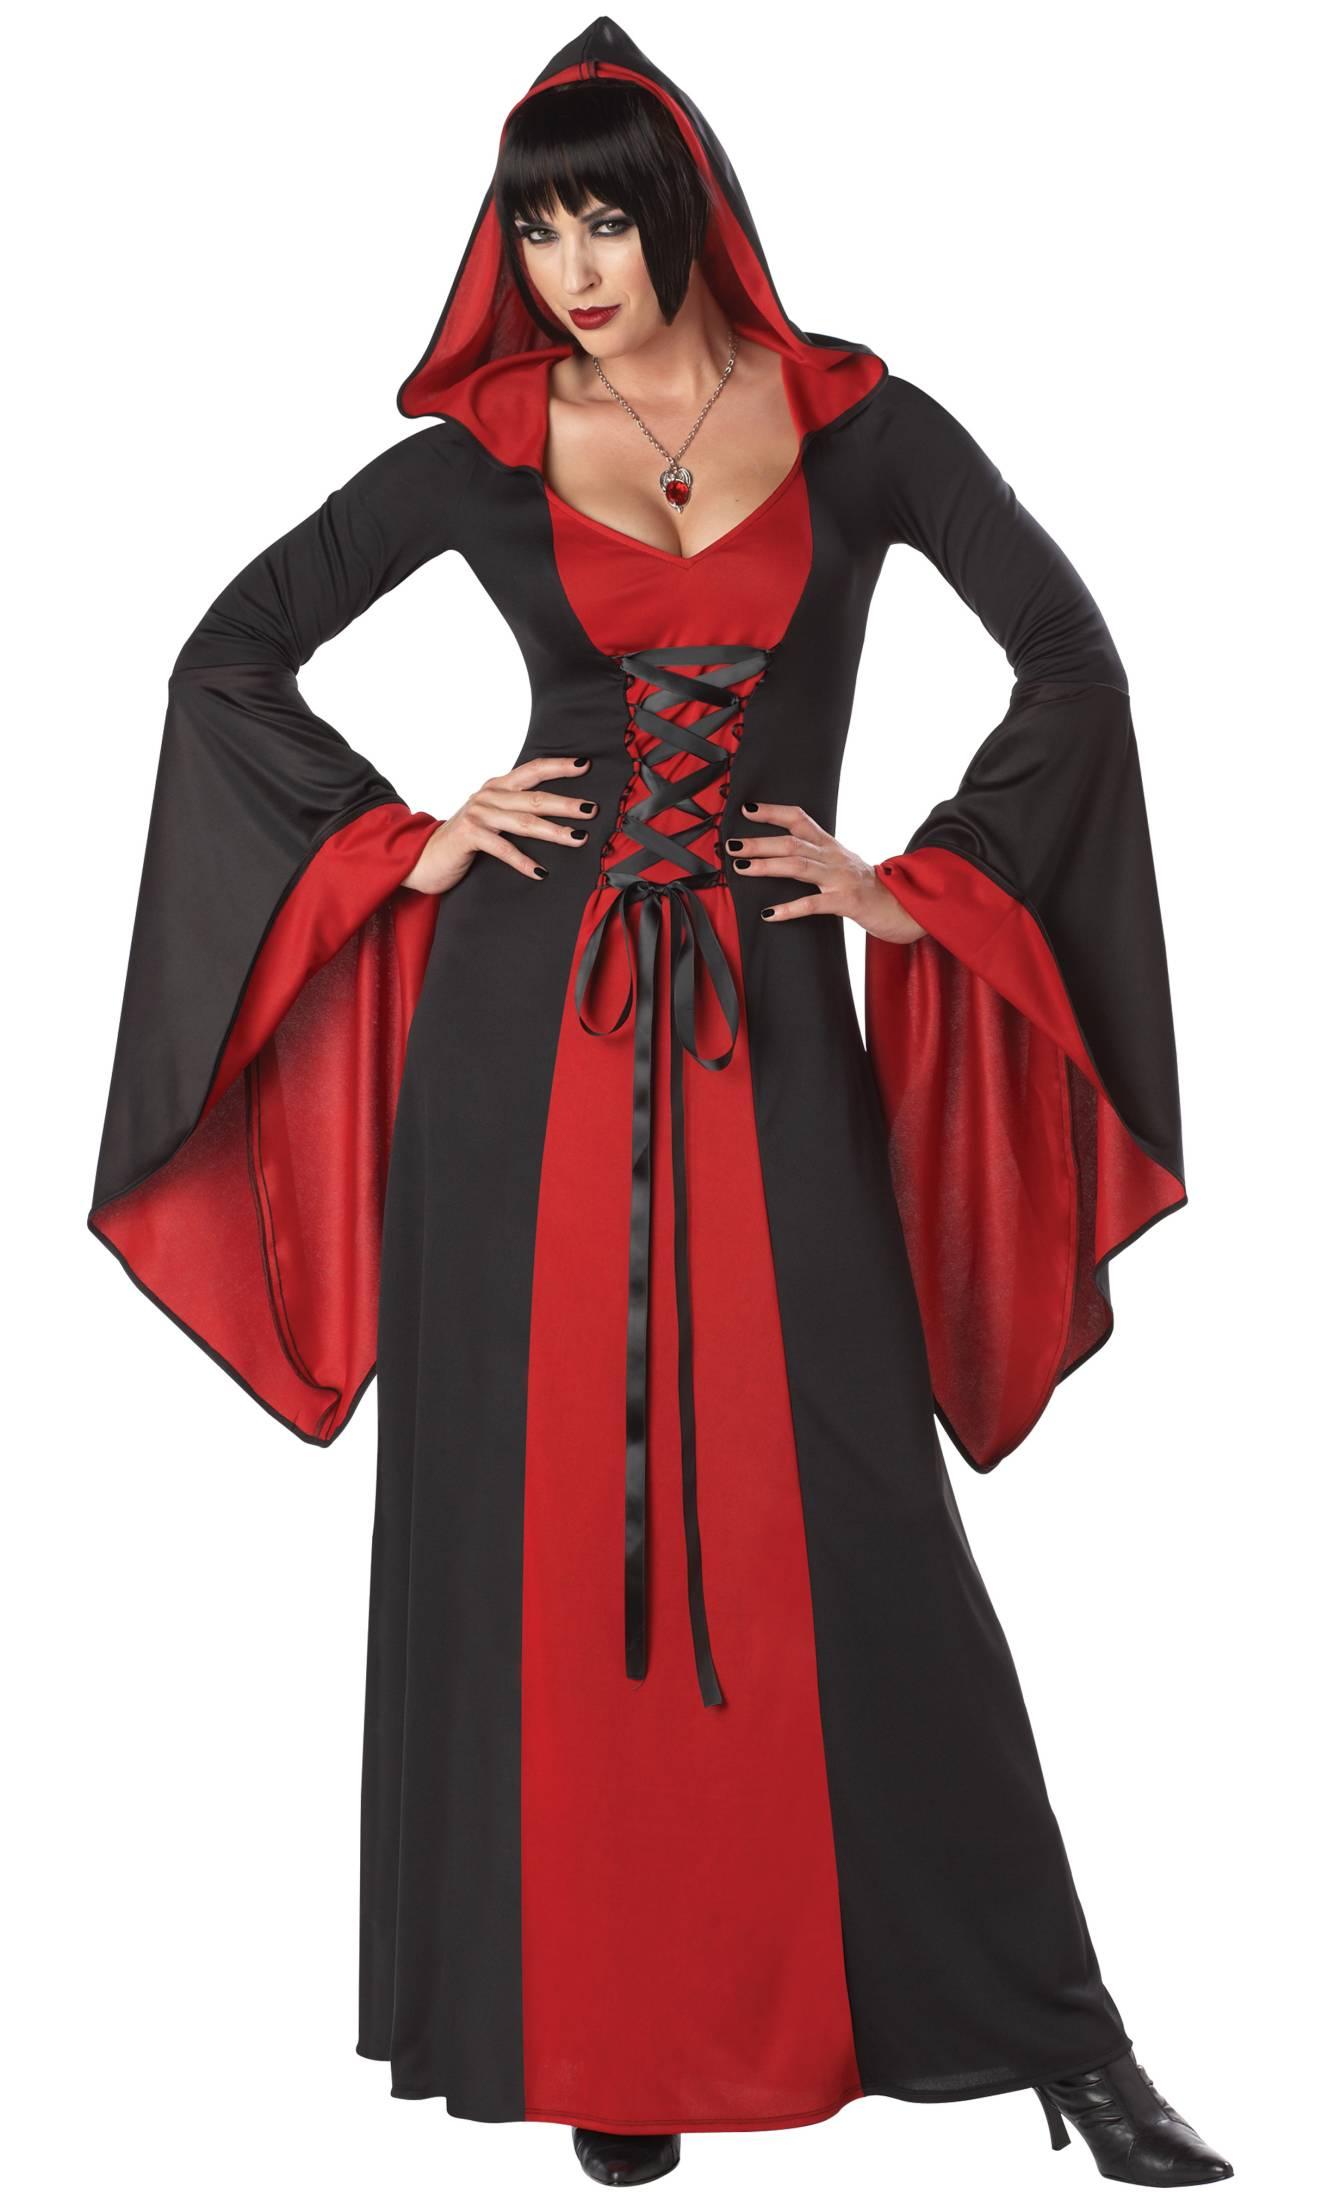 Costume-Sorcière-Maudite-Rouge